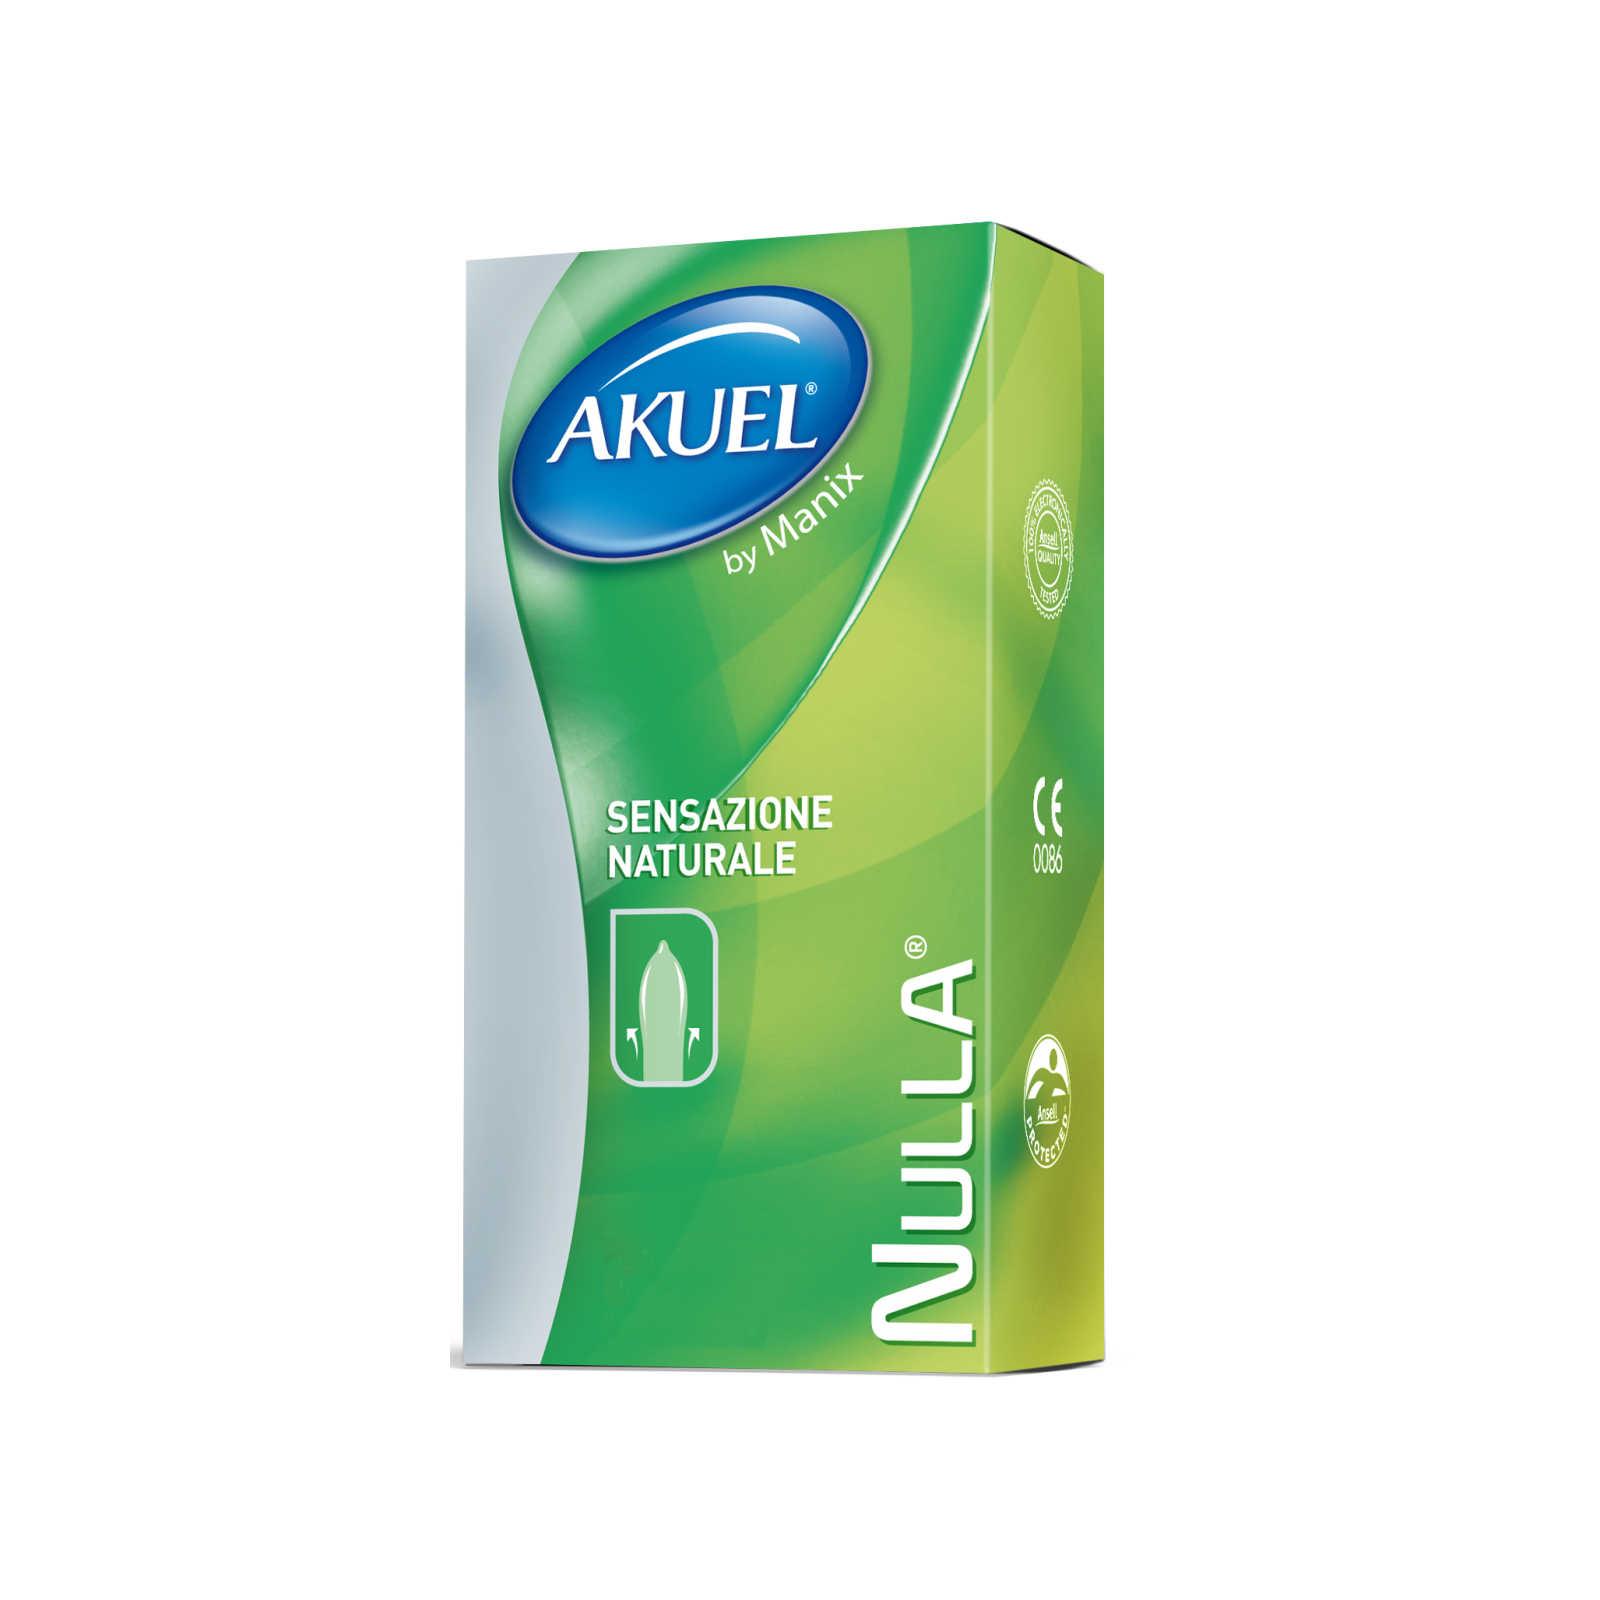 Akuel - Nulla - Profilattici 6 Pezzi